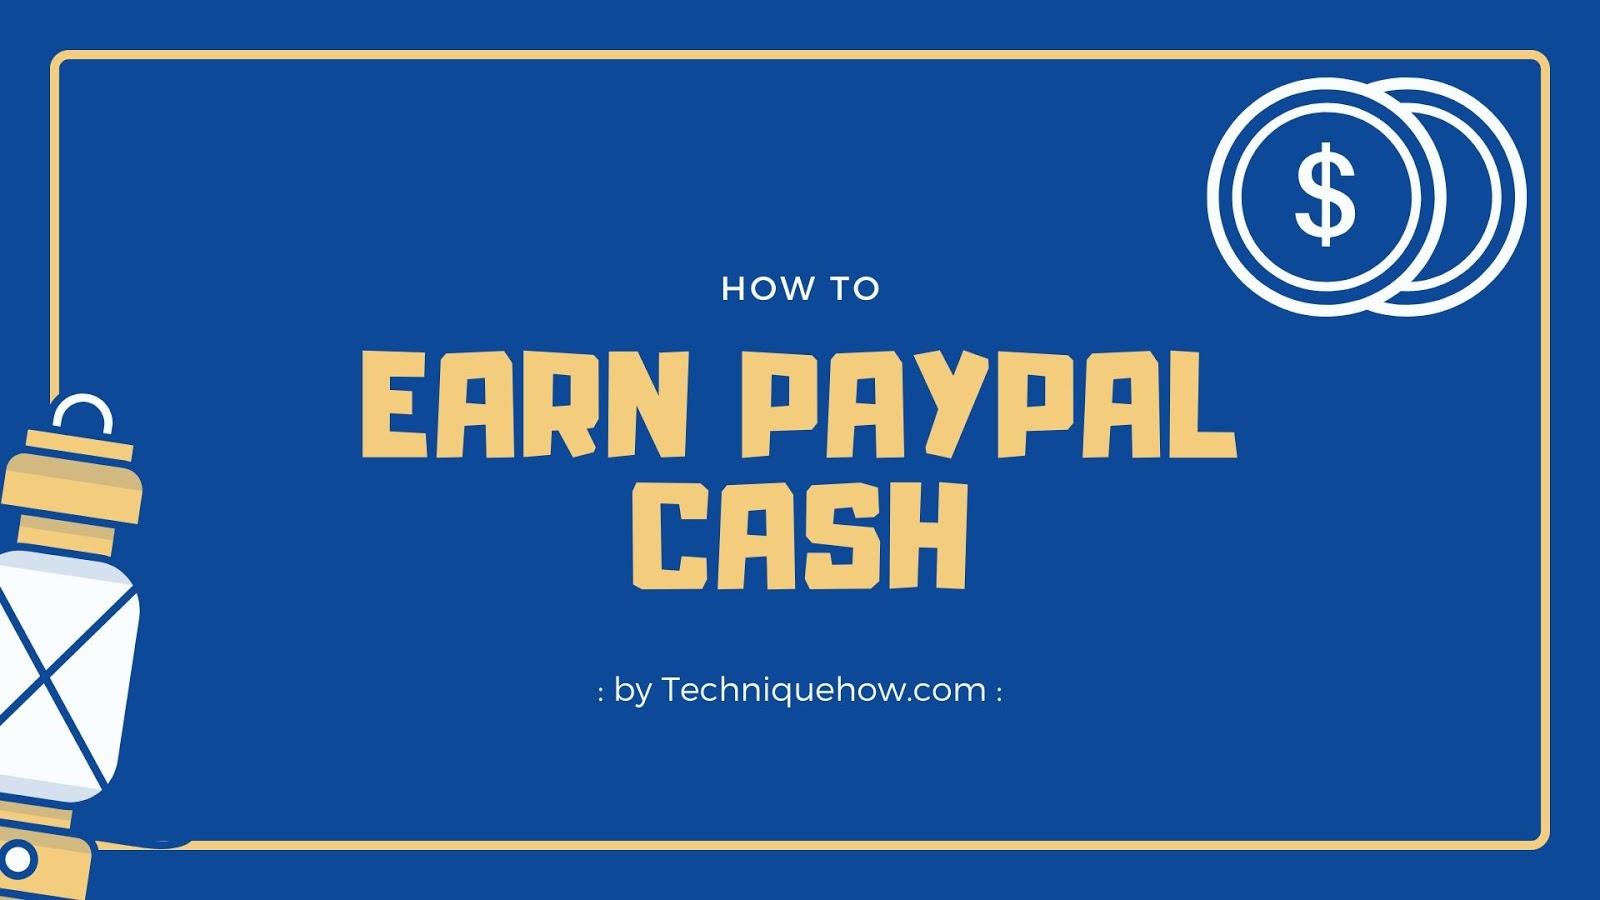 earn paypal cash